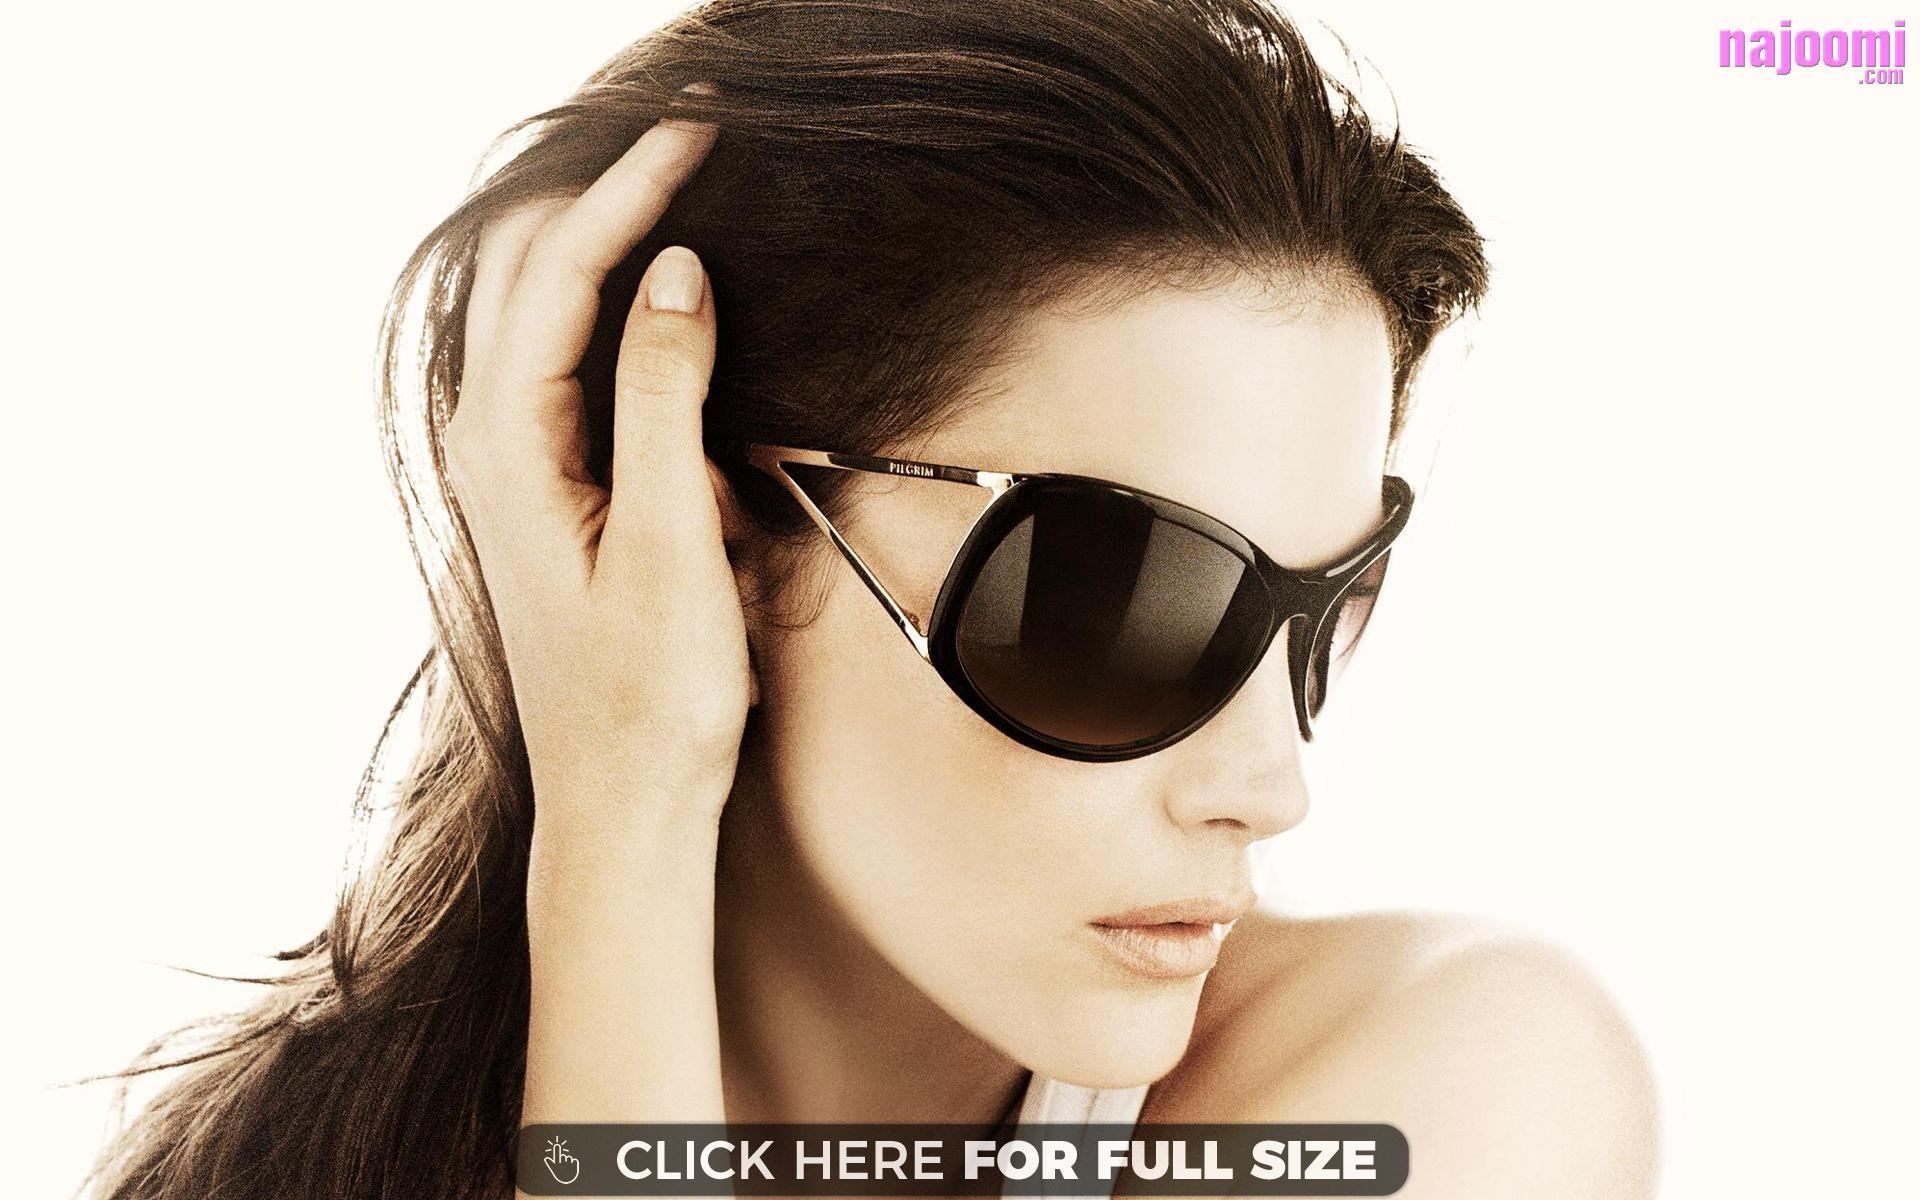 db16db38576 Liv Tyler Sunglasses